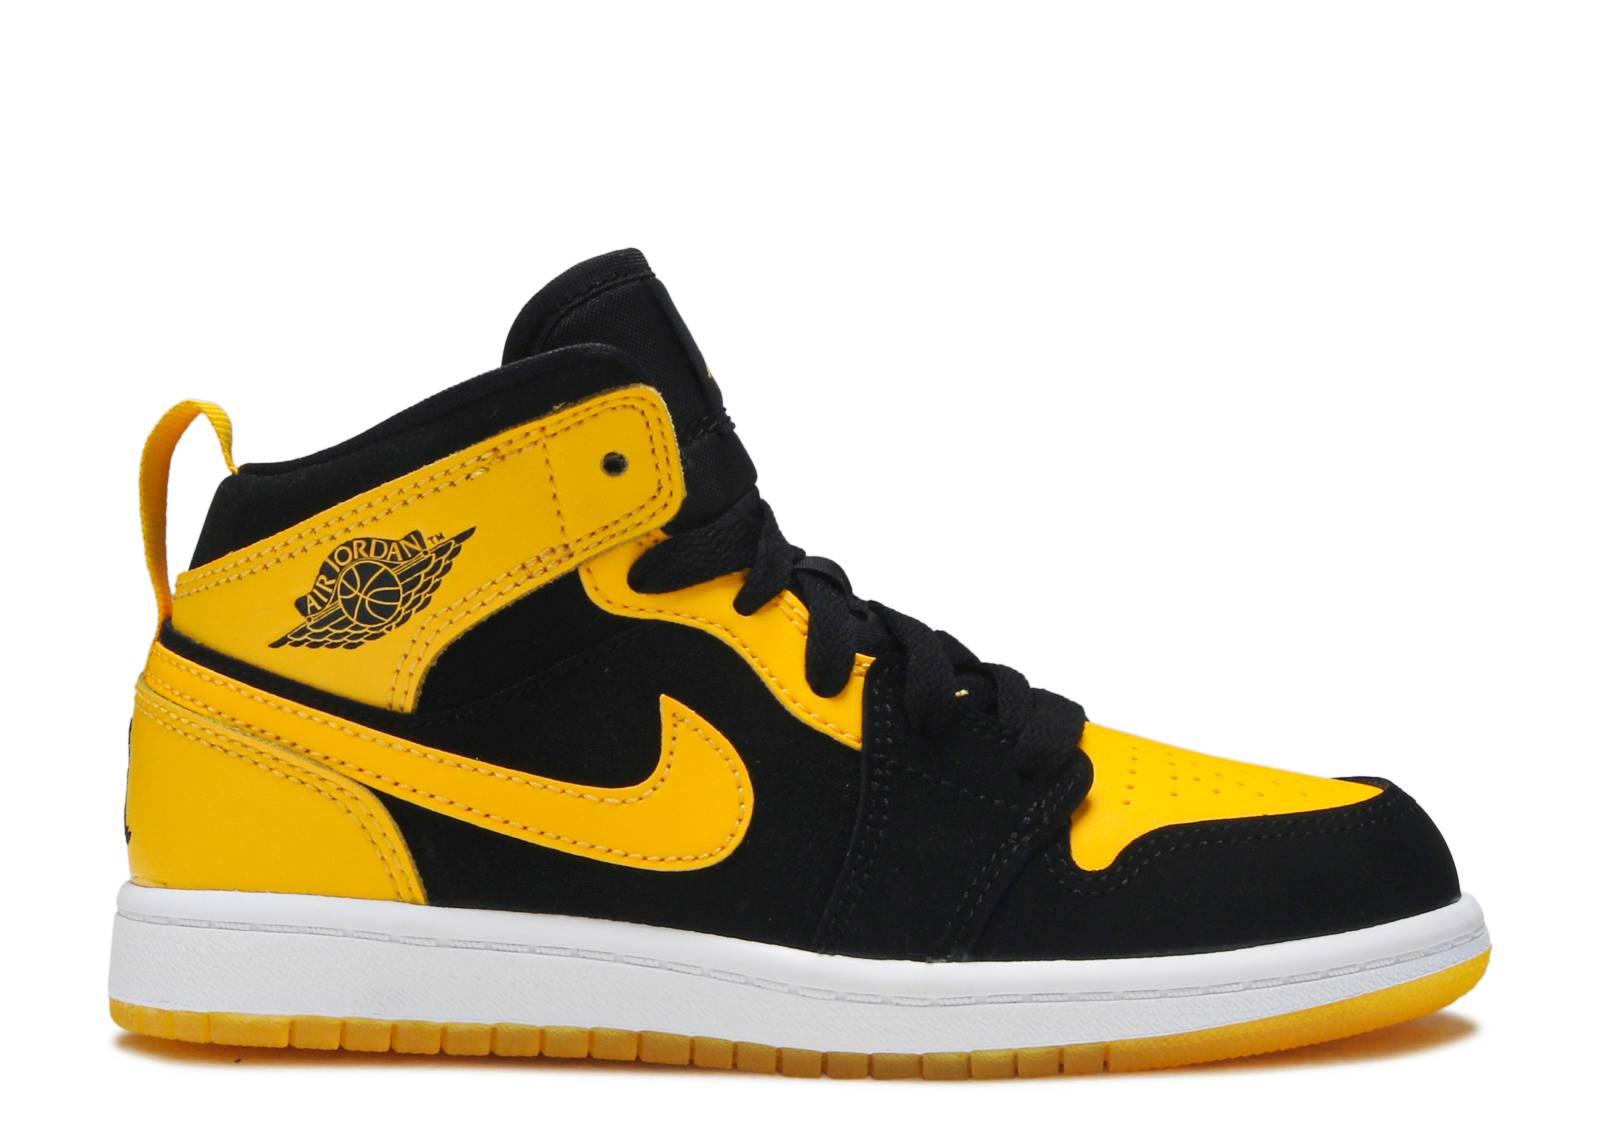 aece9b59ca59 Jordan 1 Mid Bp - Nike - 640734 035 - black varsity maize-white ...